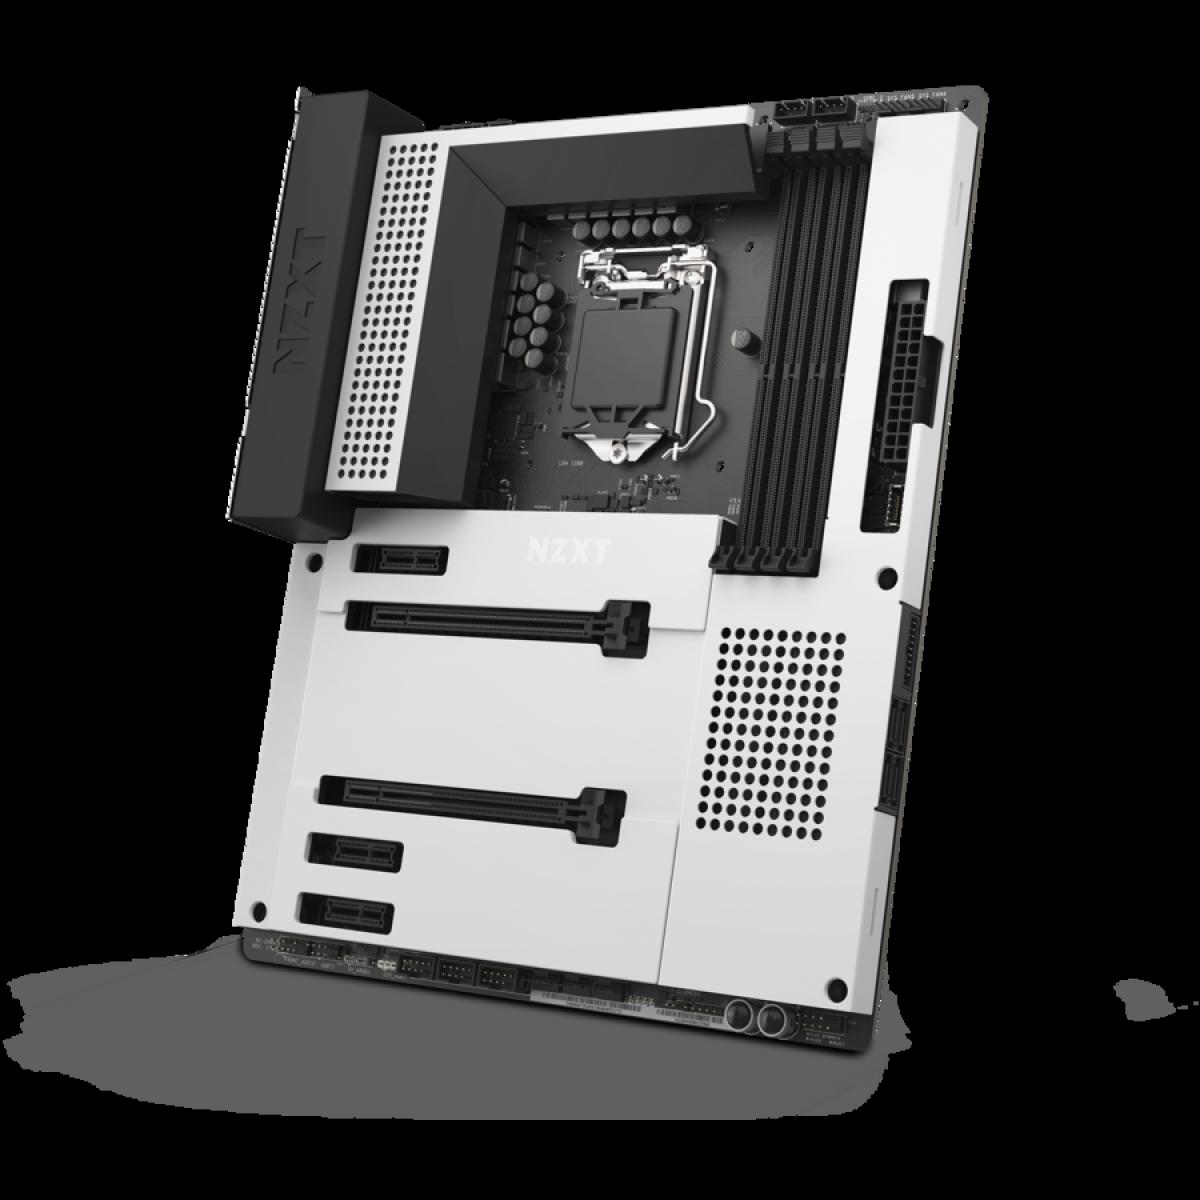 Placa Mãe NZXT N7 Z490, Chipset Z490, Intel LGA 1200, ATX, DDR4, White, N7-Z49XT-W1